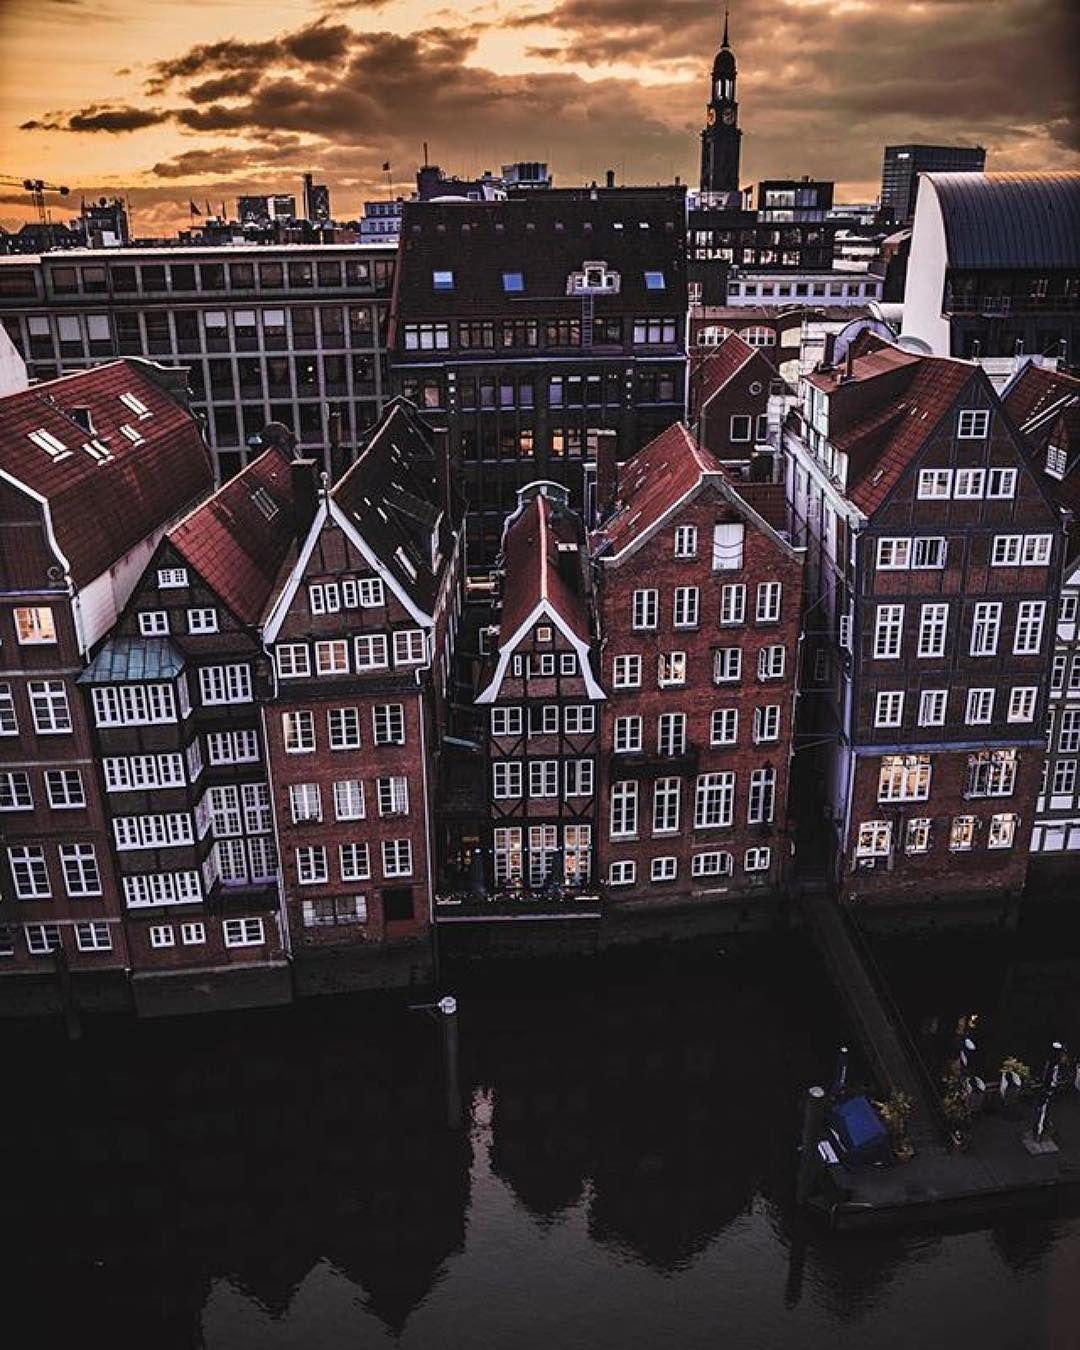 Hamburg Nikolaifleet 2 140 Likes 20 Comments Hamburg Ahoi Hamburgahoi On Instagram Our Phot Of The Week Was Ta Hamburg Germany Germany Travel Germany